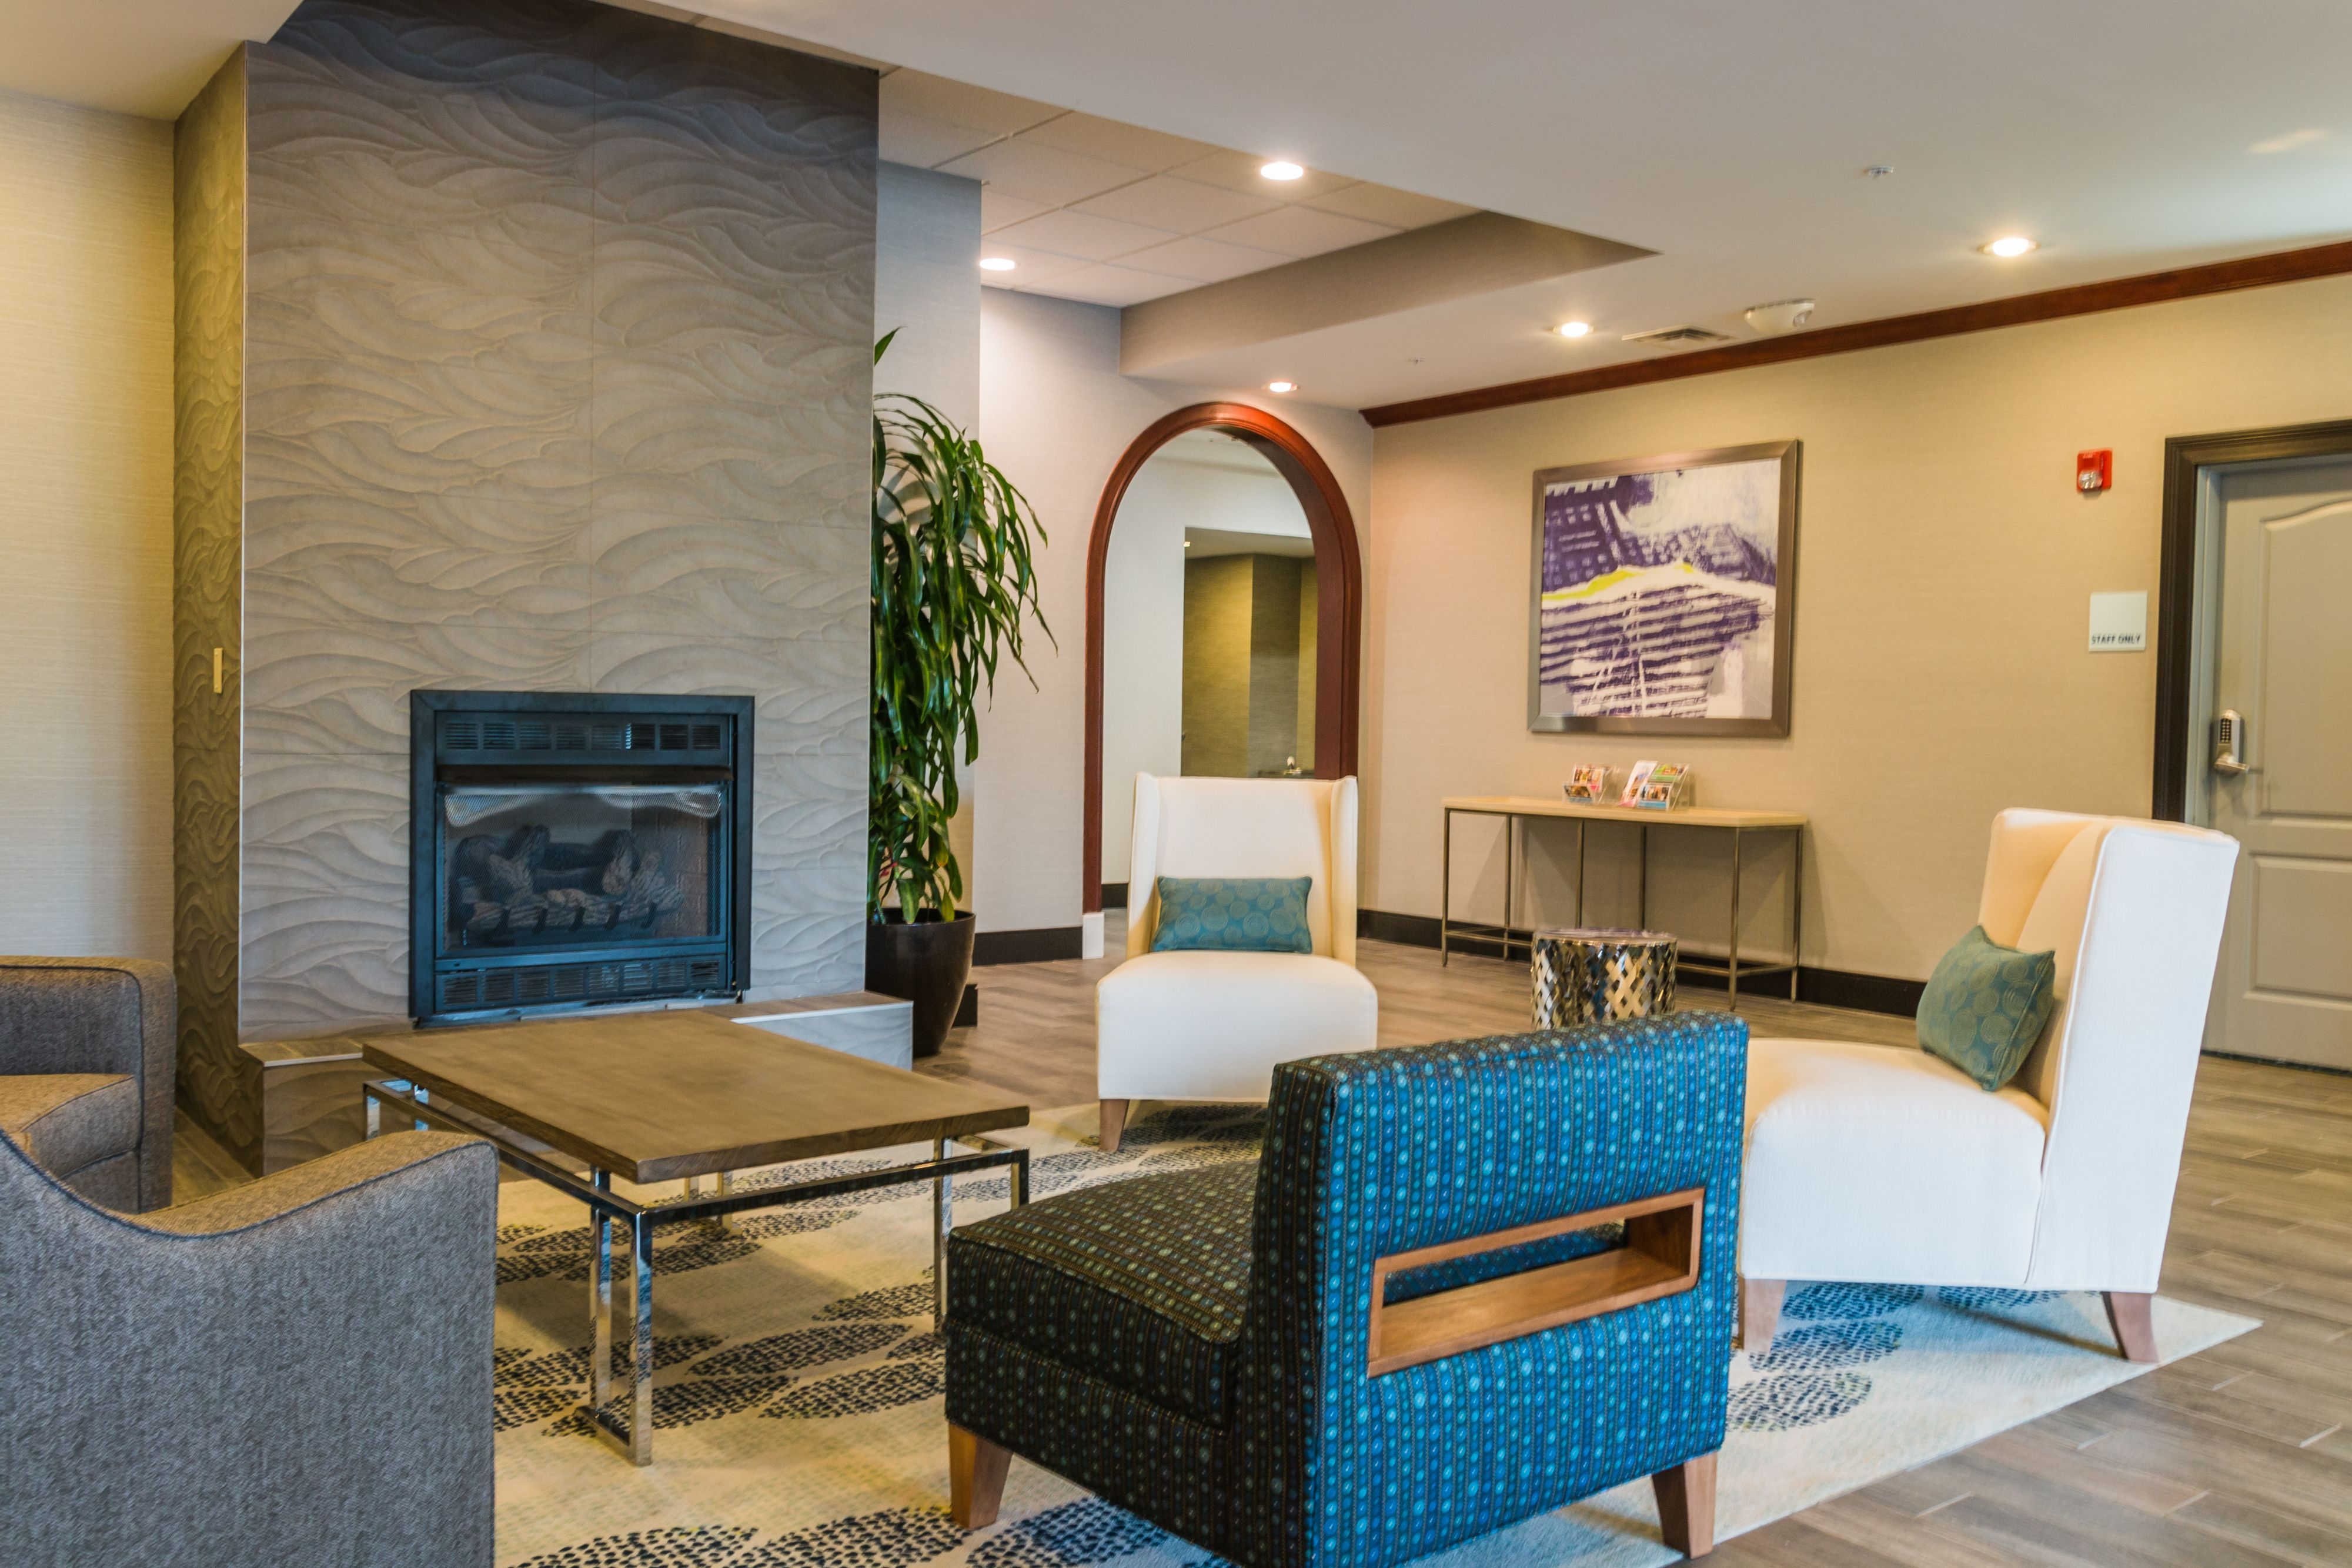 Holiday Inn Express & Suites Jackson image 2